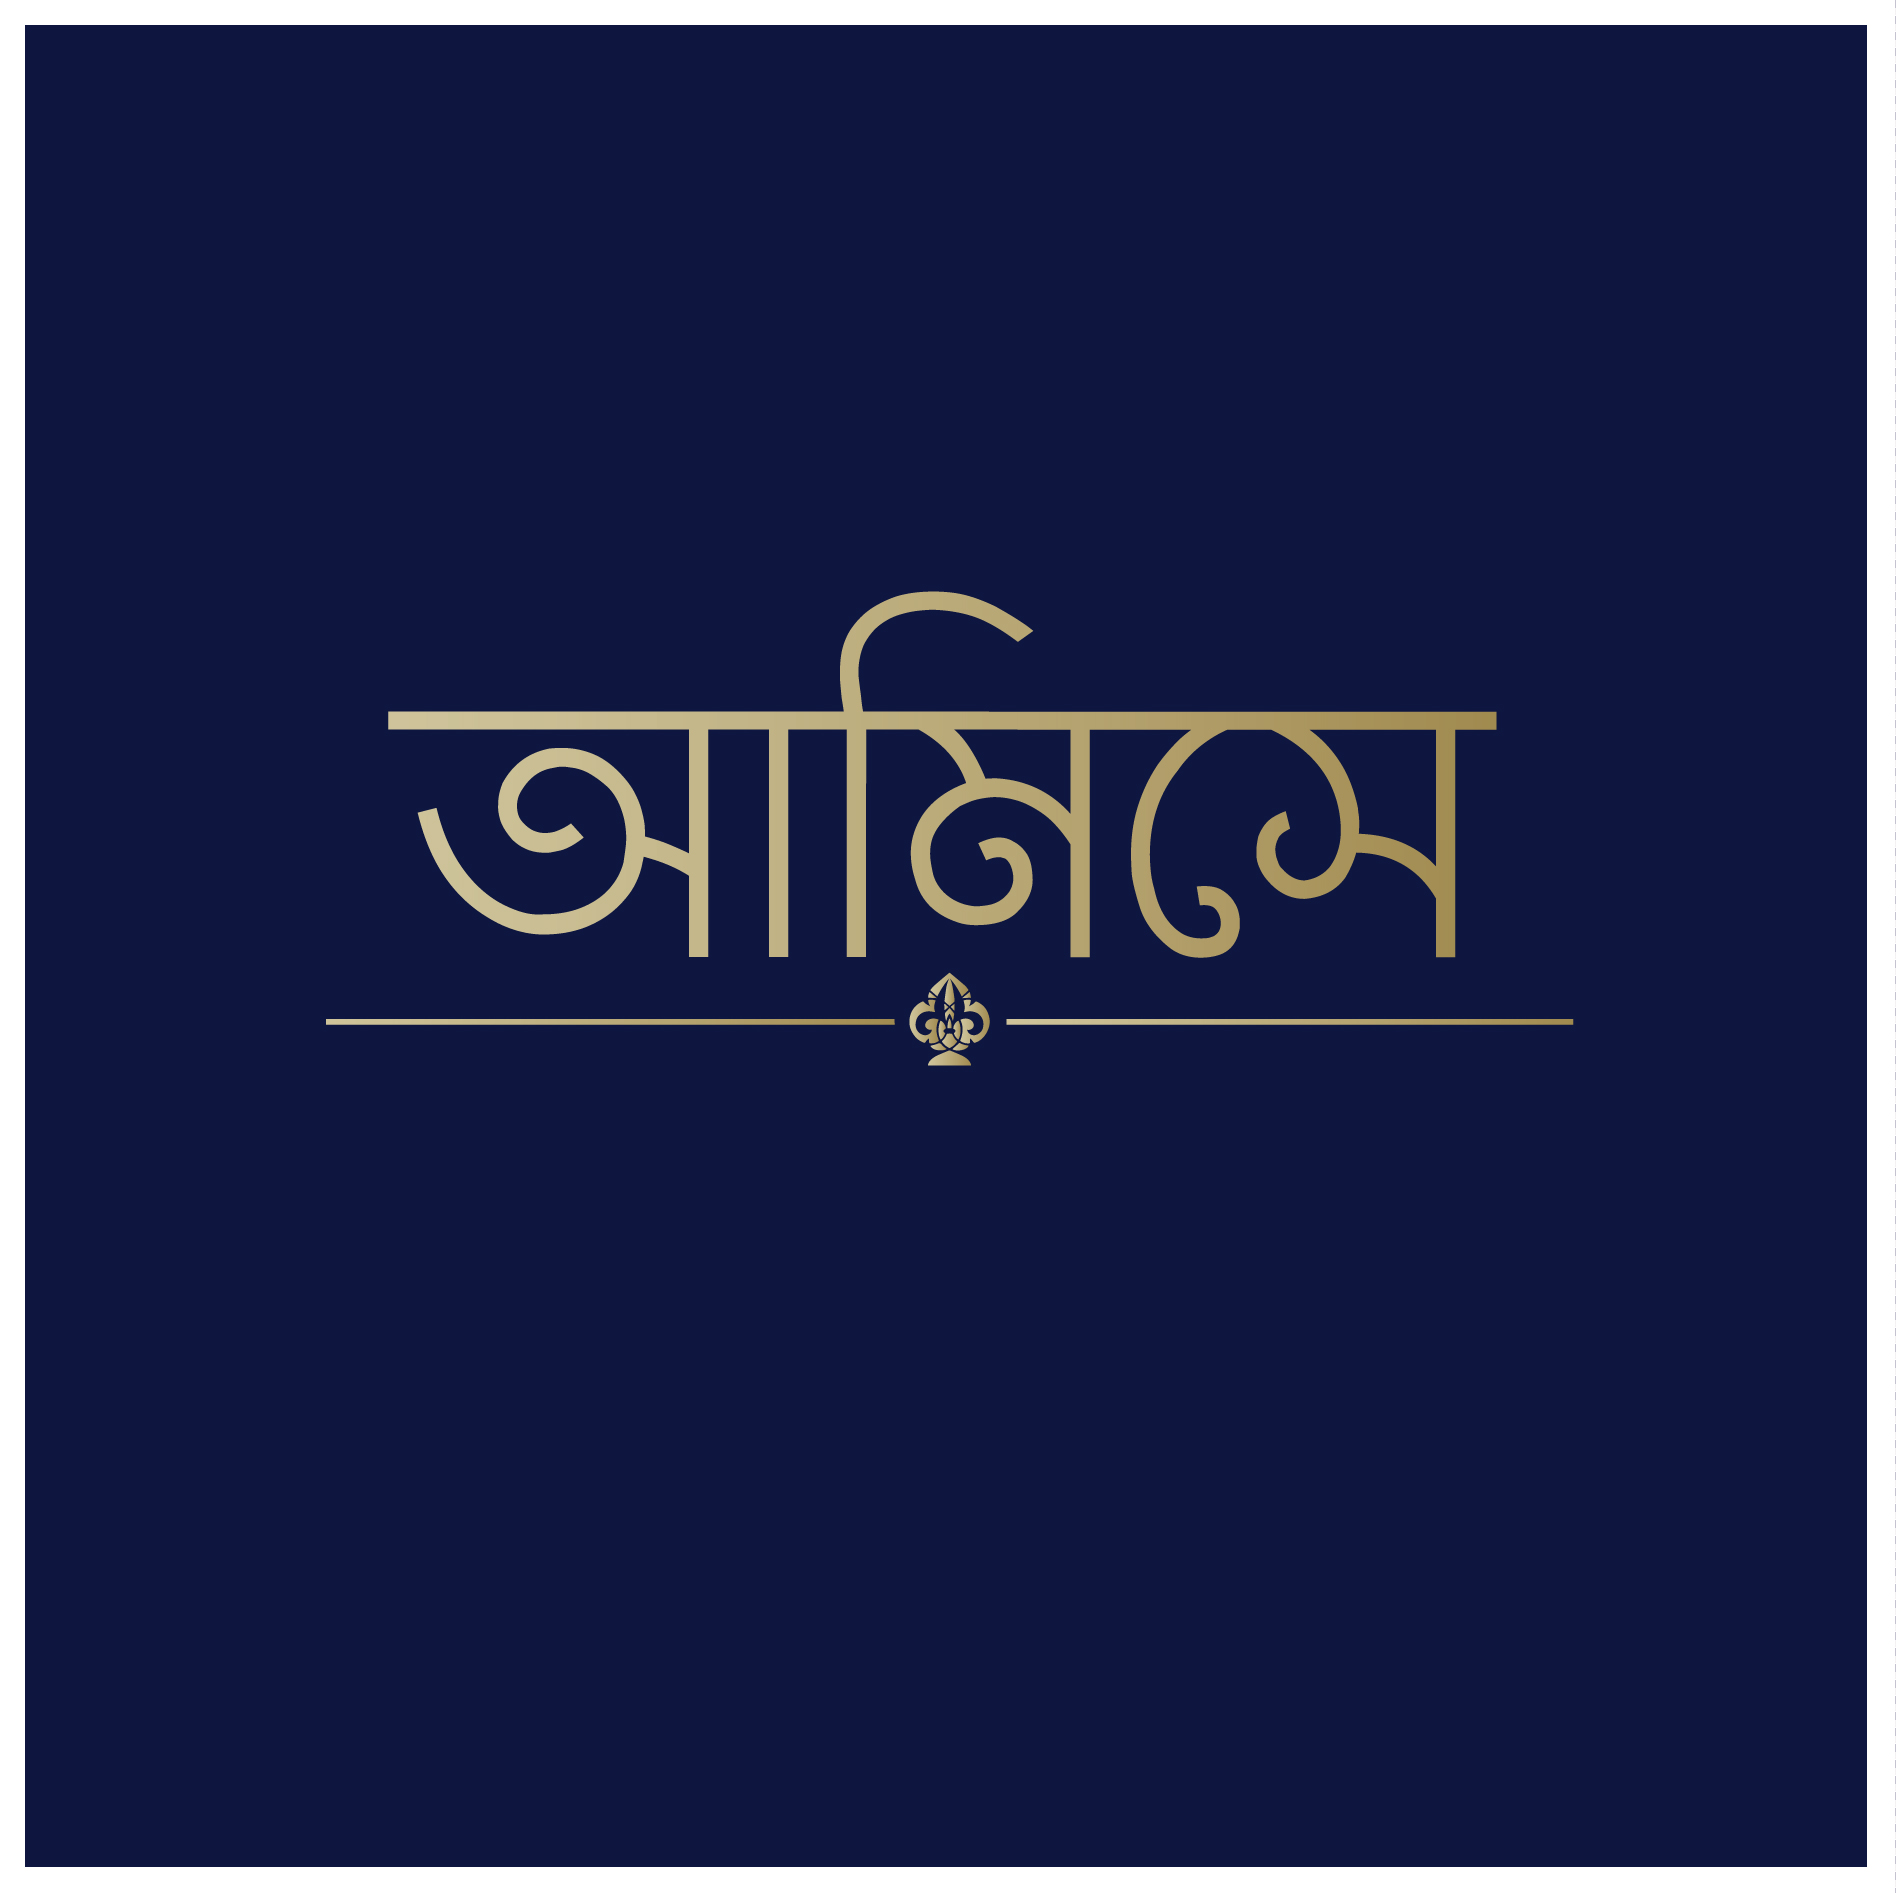 File:AMISHE LOGO (Bangla) 01 jpg - Wikimedia Commons